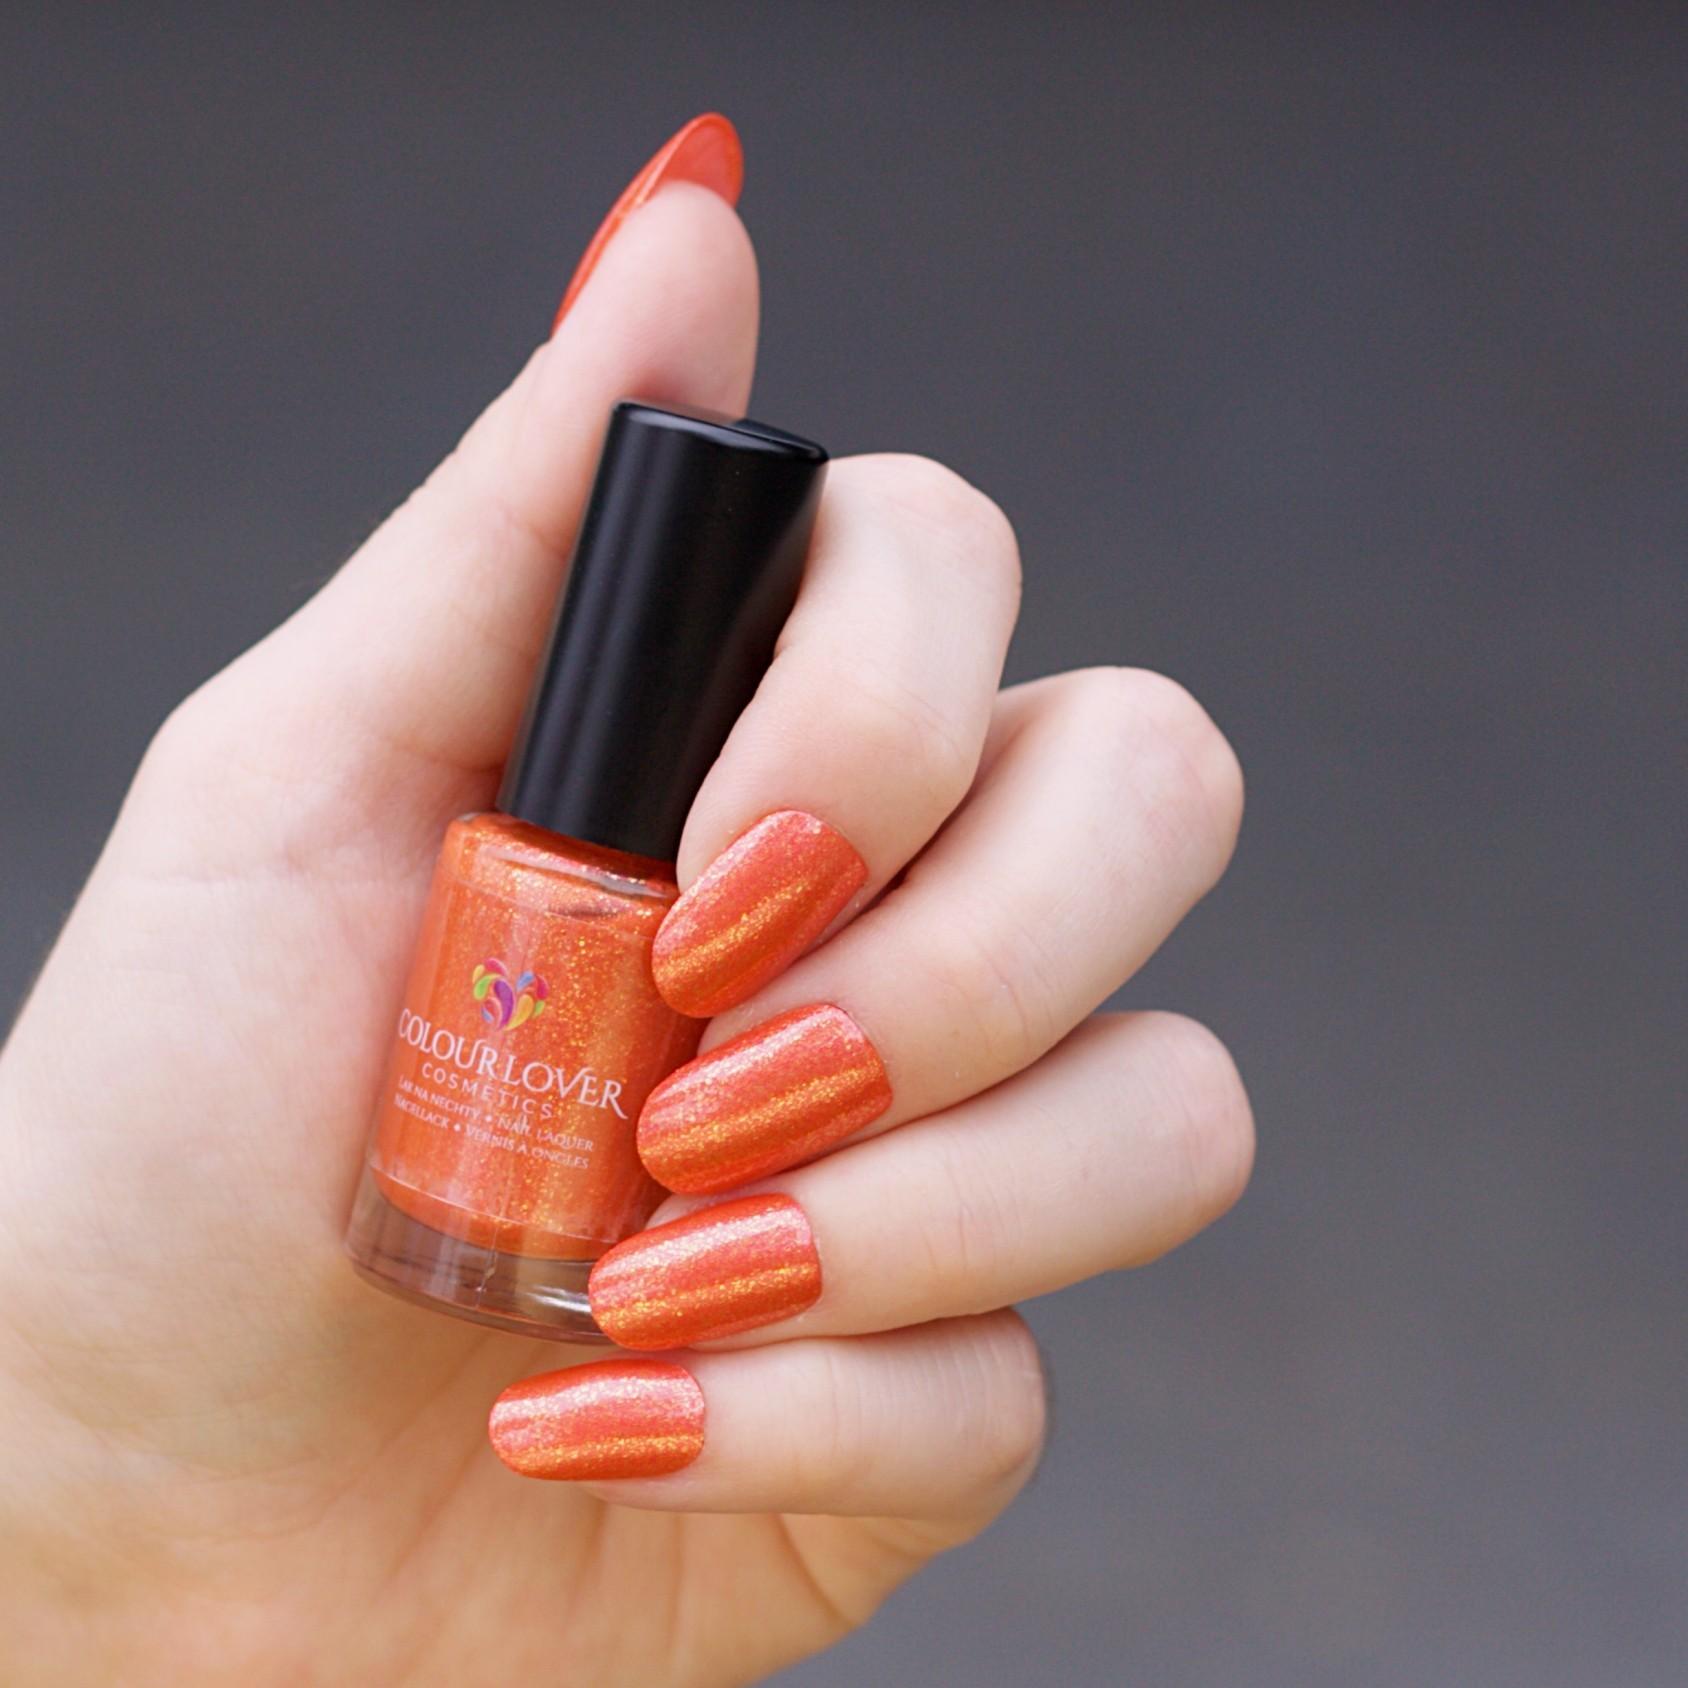 marigold colour lover cosmetics